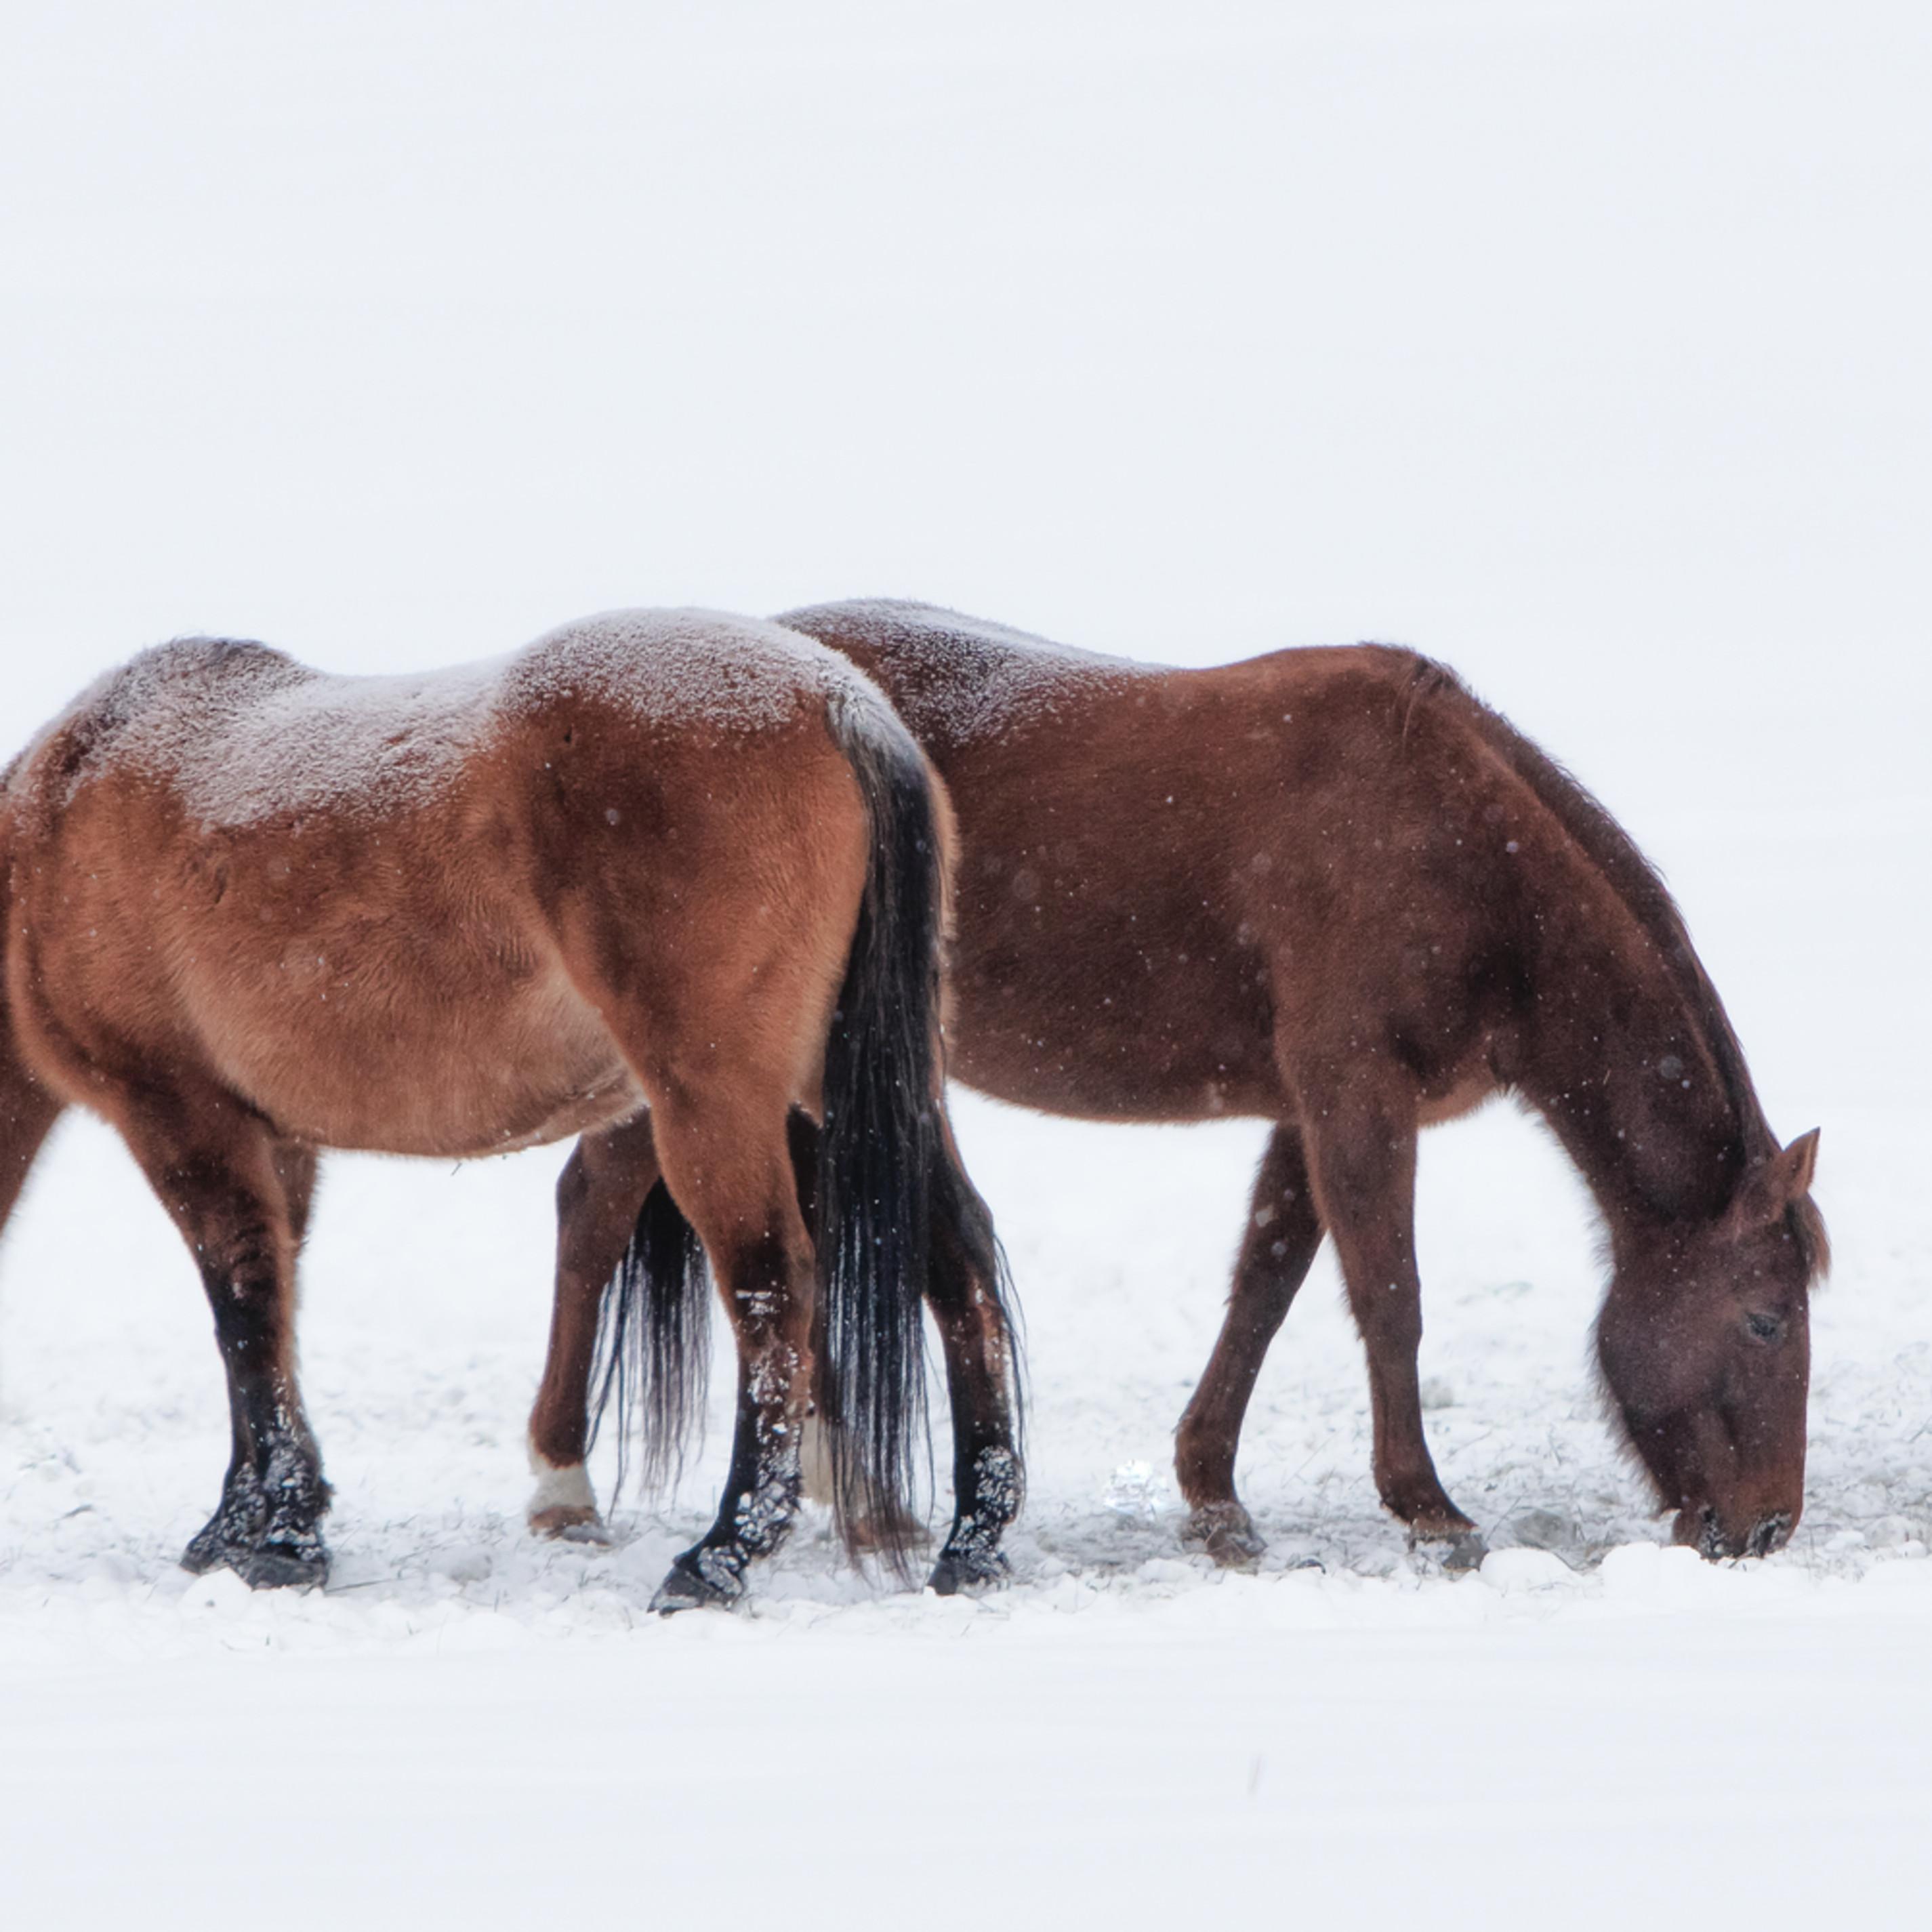 Winter blankets ujhwzj